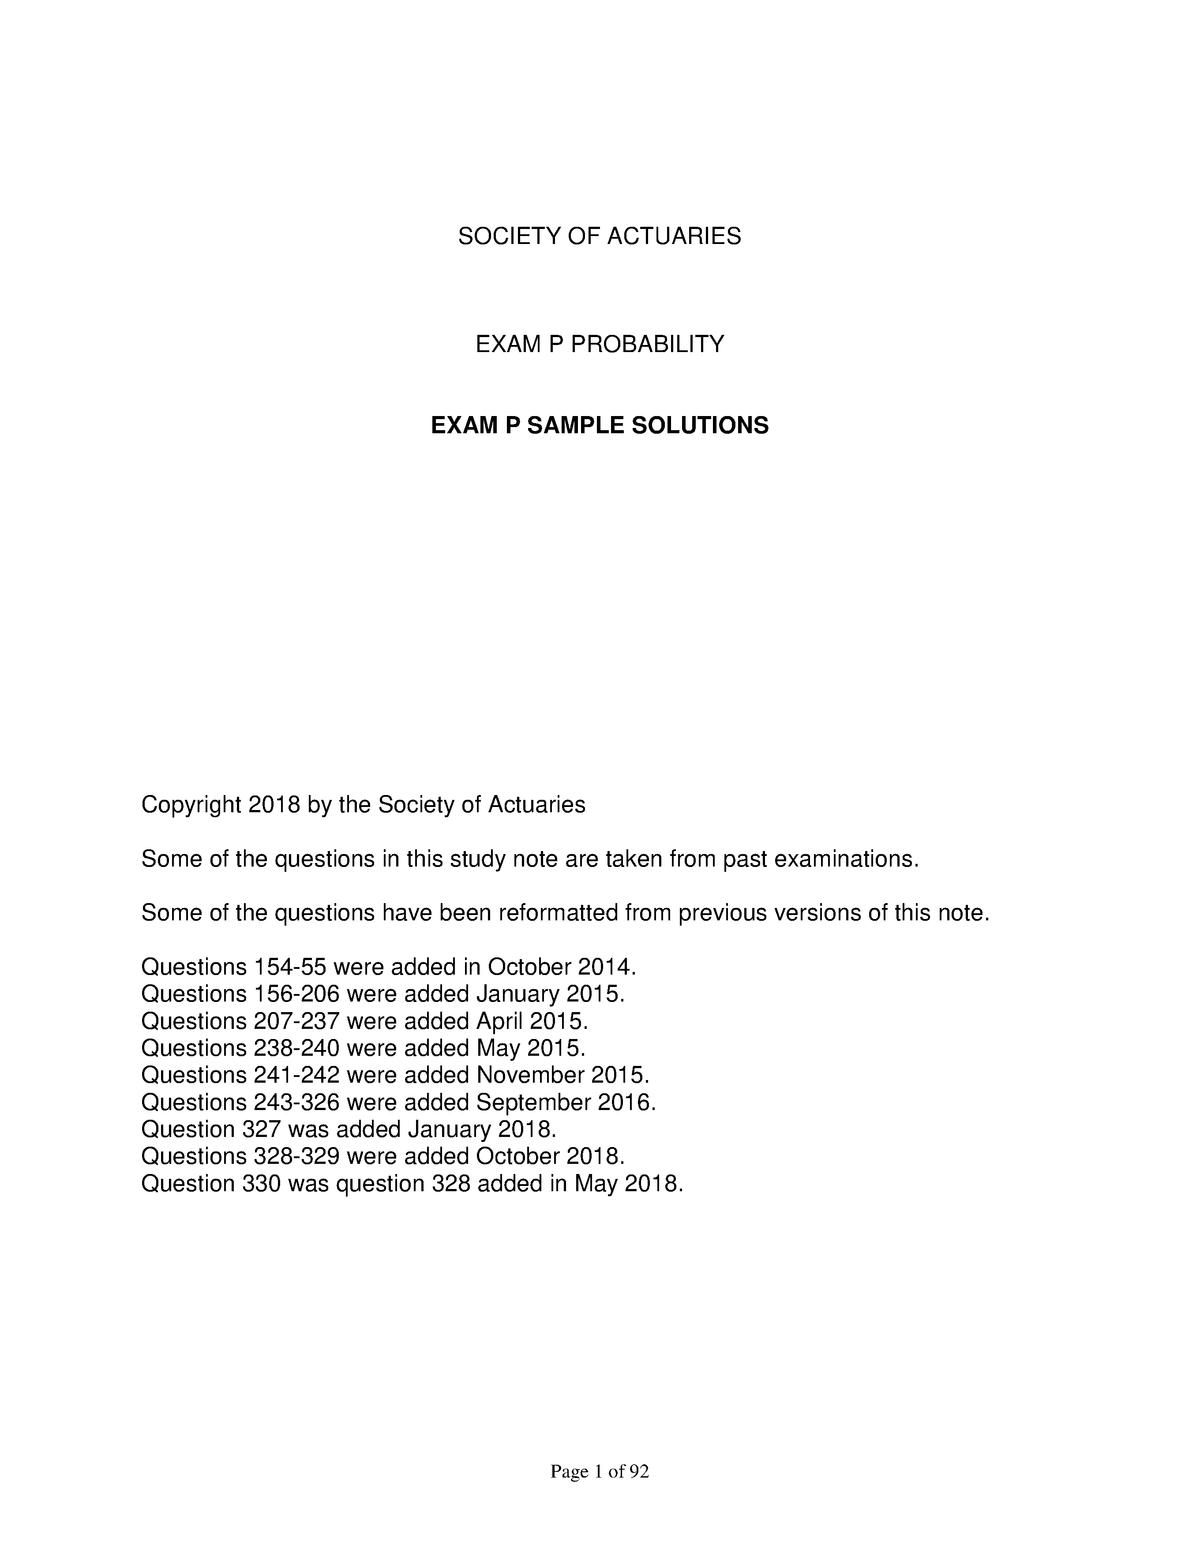 Edu exam p sample sol - Stat 230: Probability - StuDocu